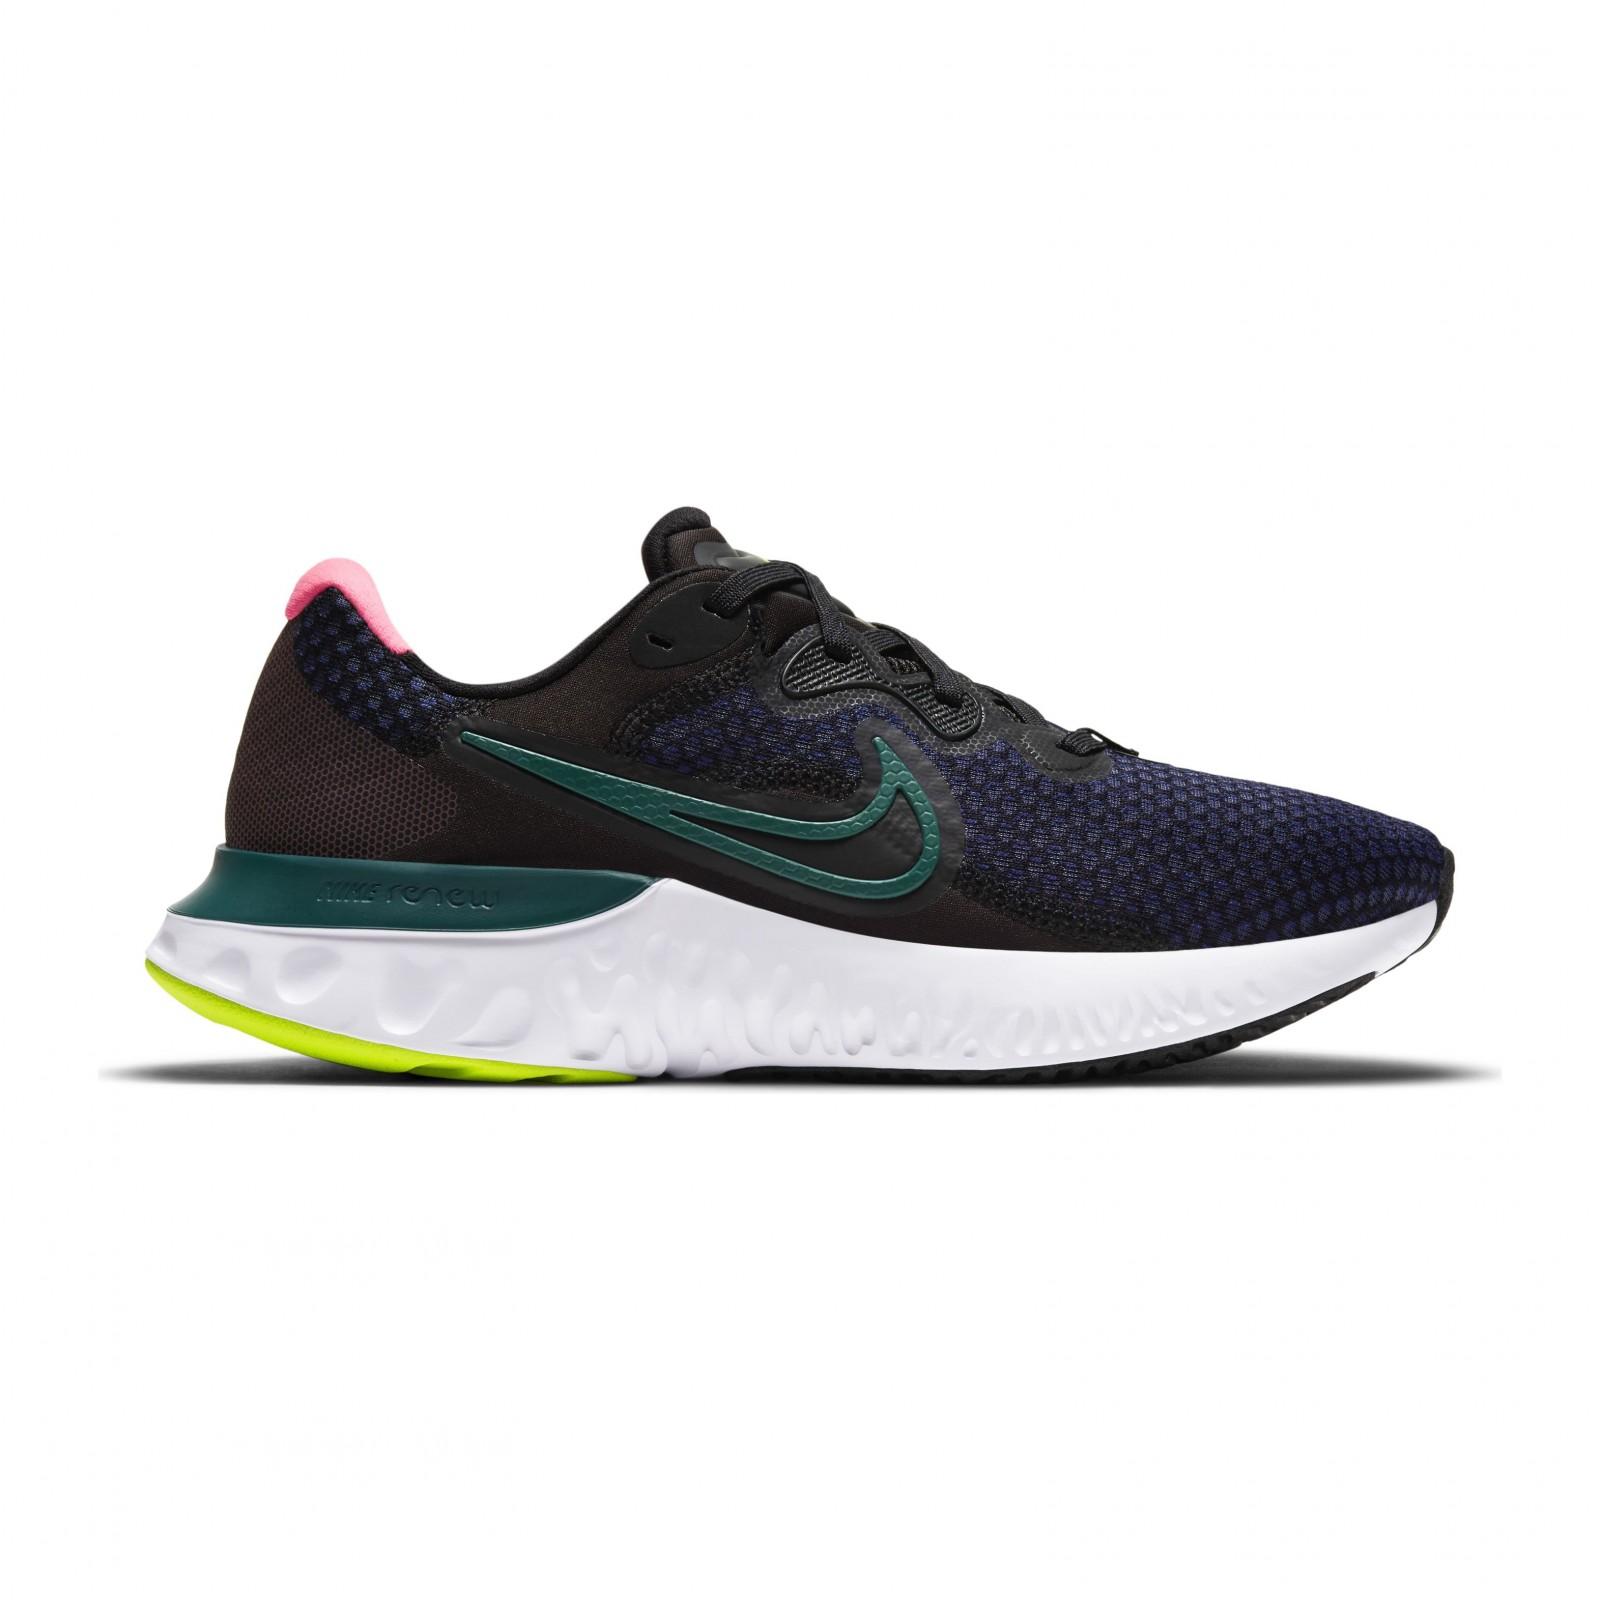 Nike Renew Run 2 BLACK/BLACKENED BLUE-DARK TEAL GREEN